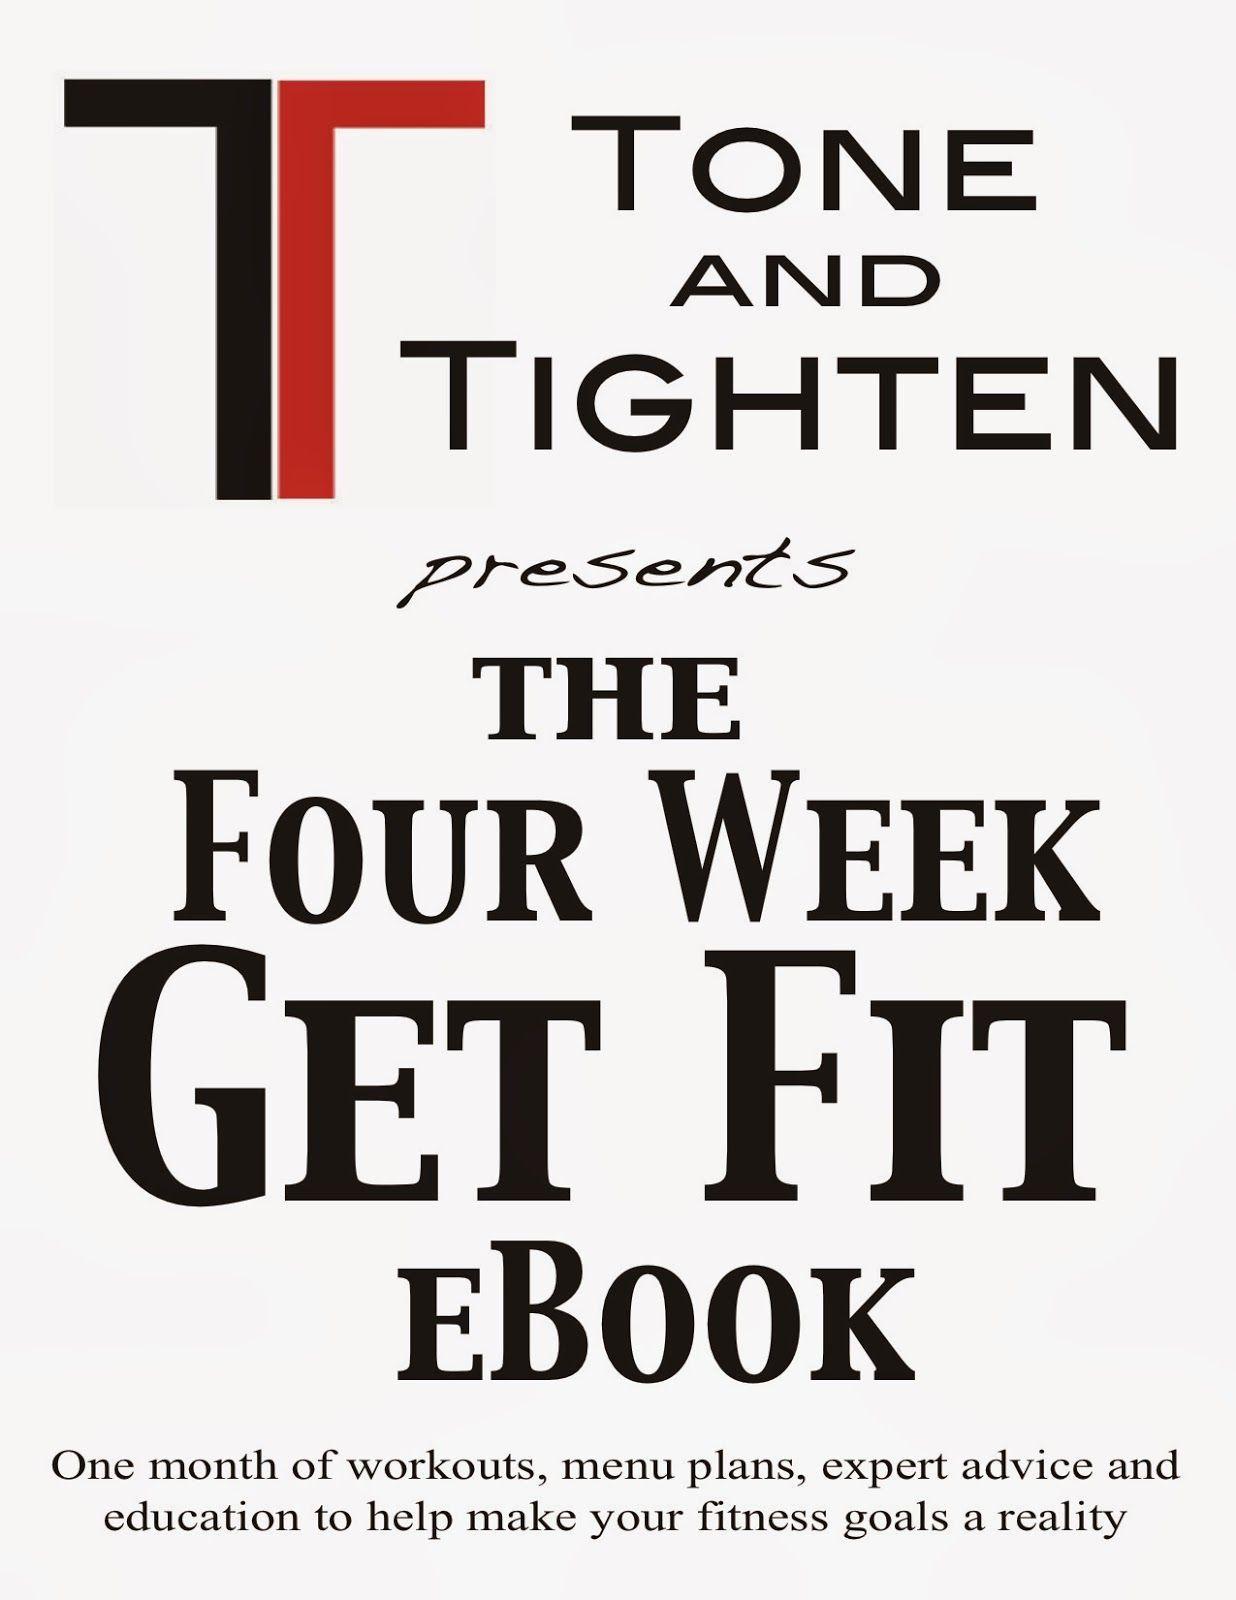 four week get fit ebook trends pinterest workout